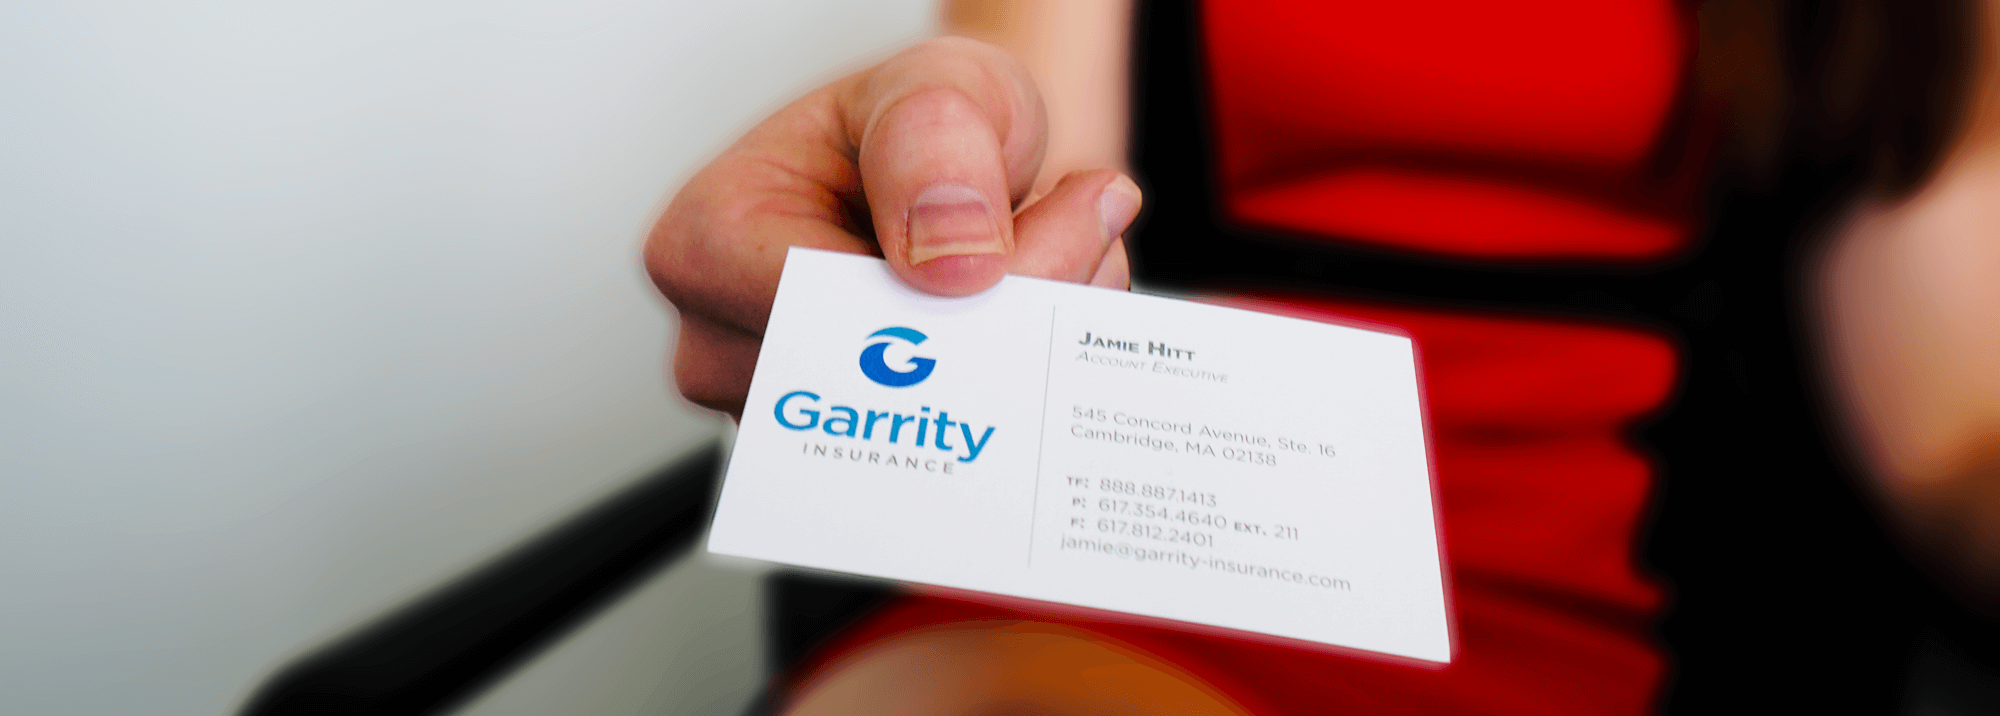 Garrity Insurance